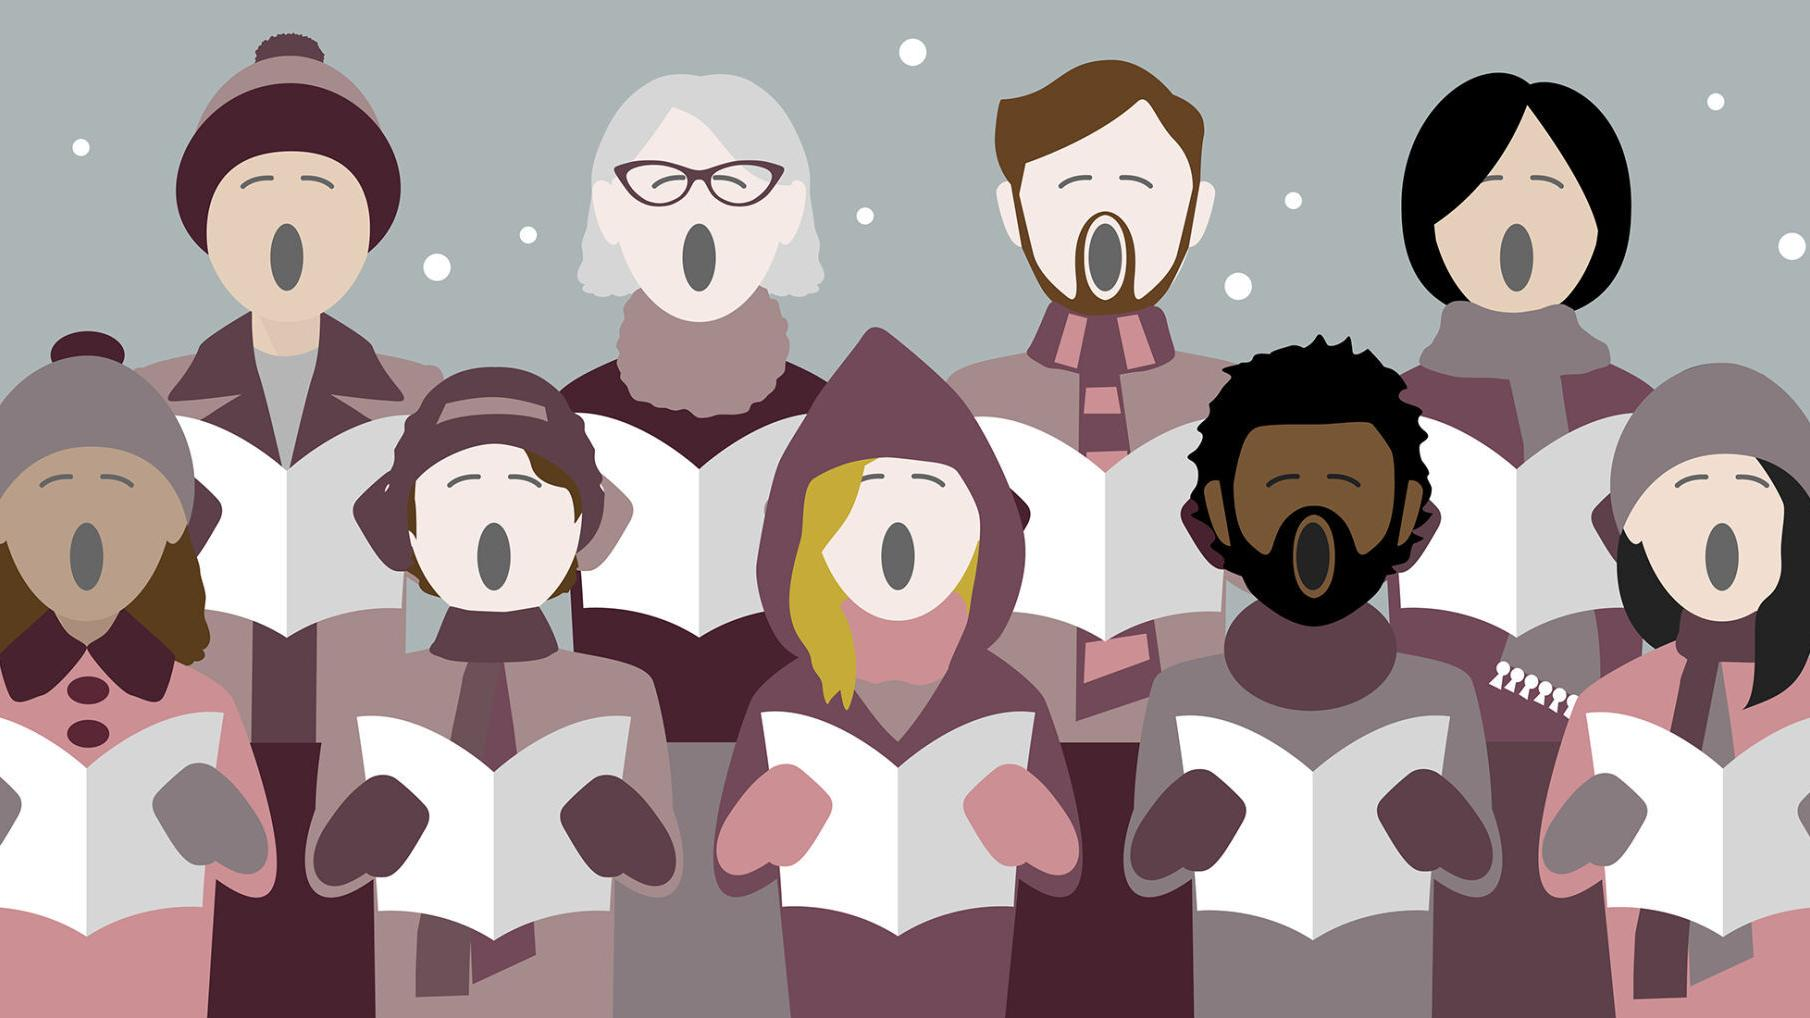 Colin Fleming: Don't cut Handel's 'Messiah' short of its glorious finish